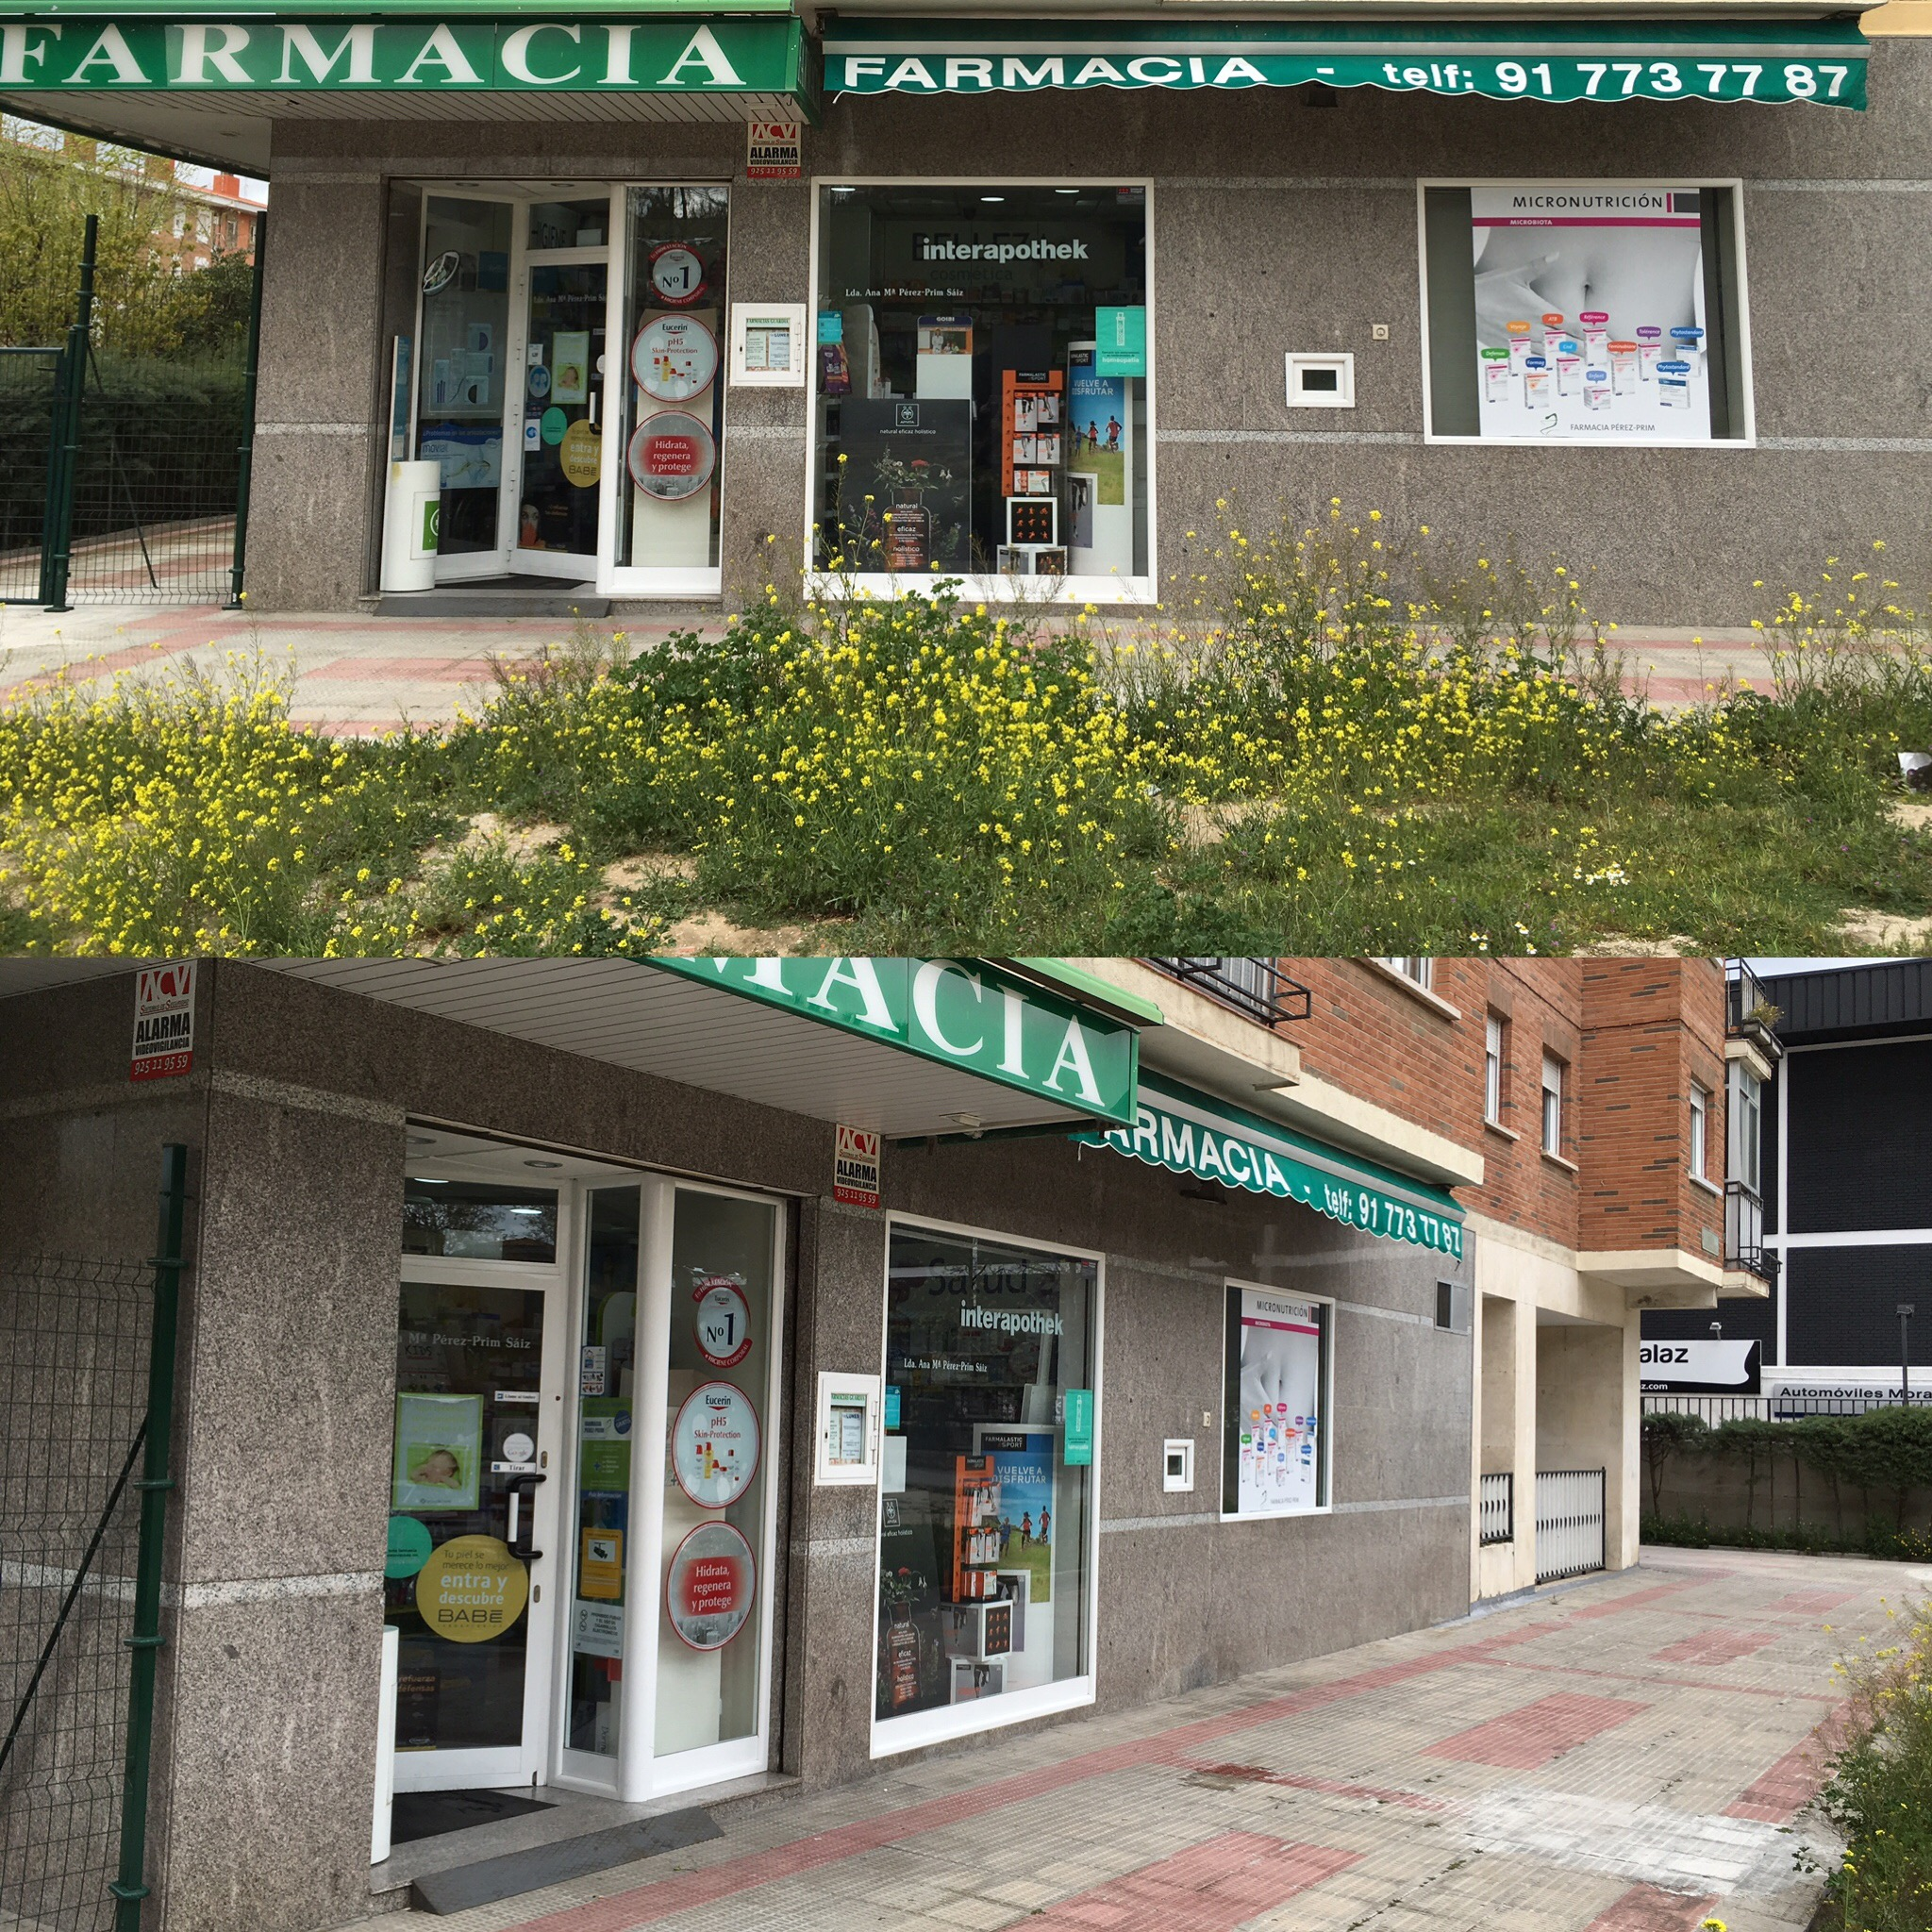 Farmacia Perez Prim